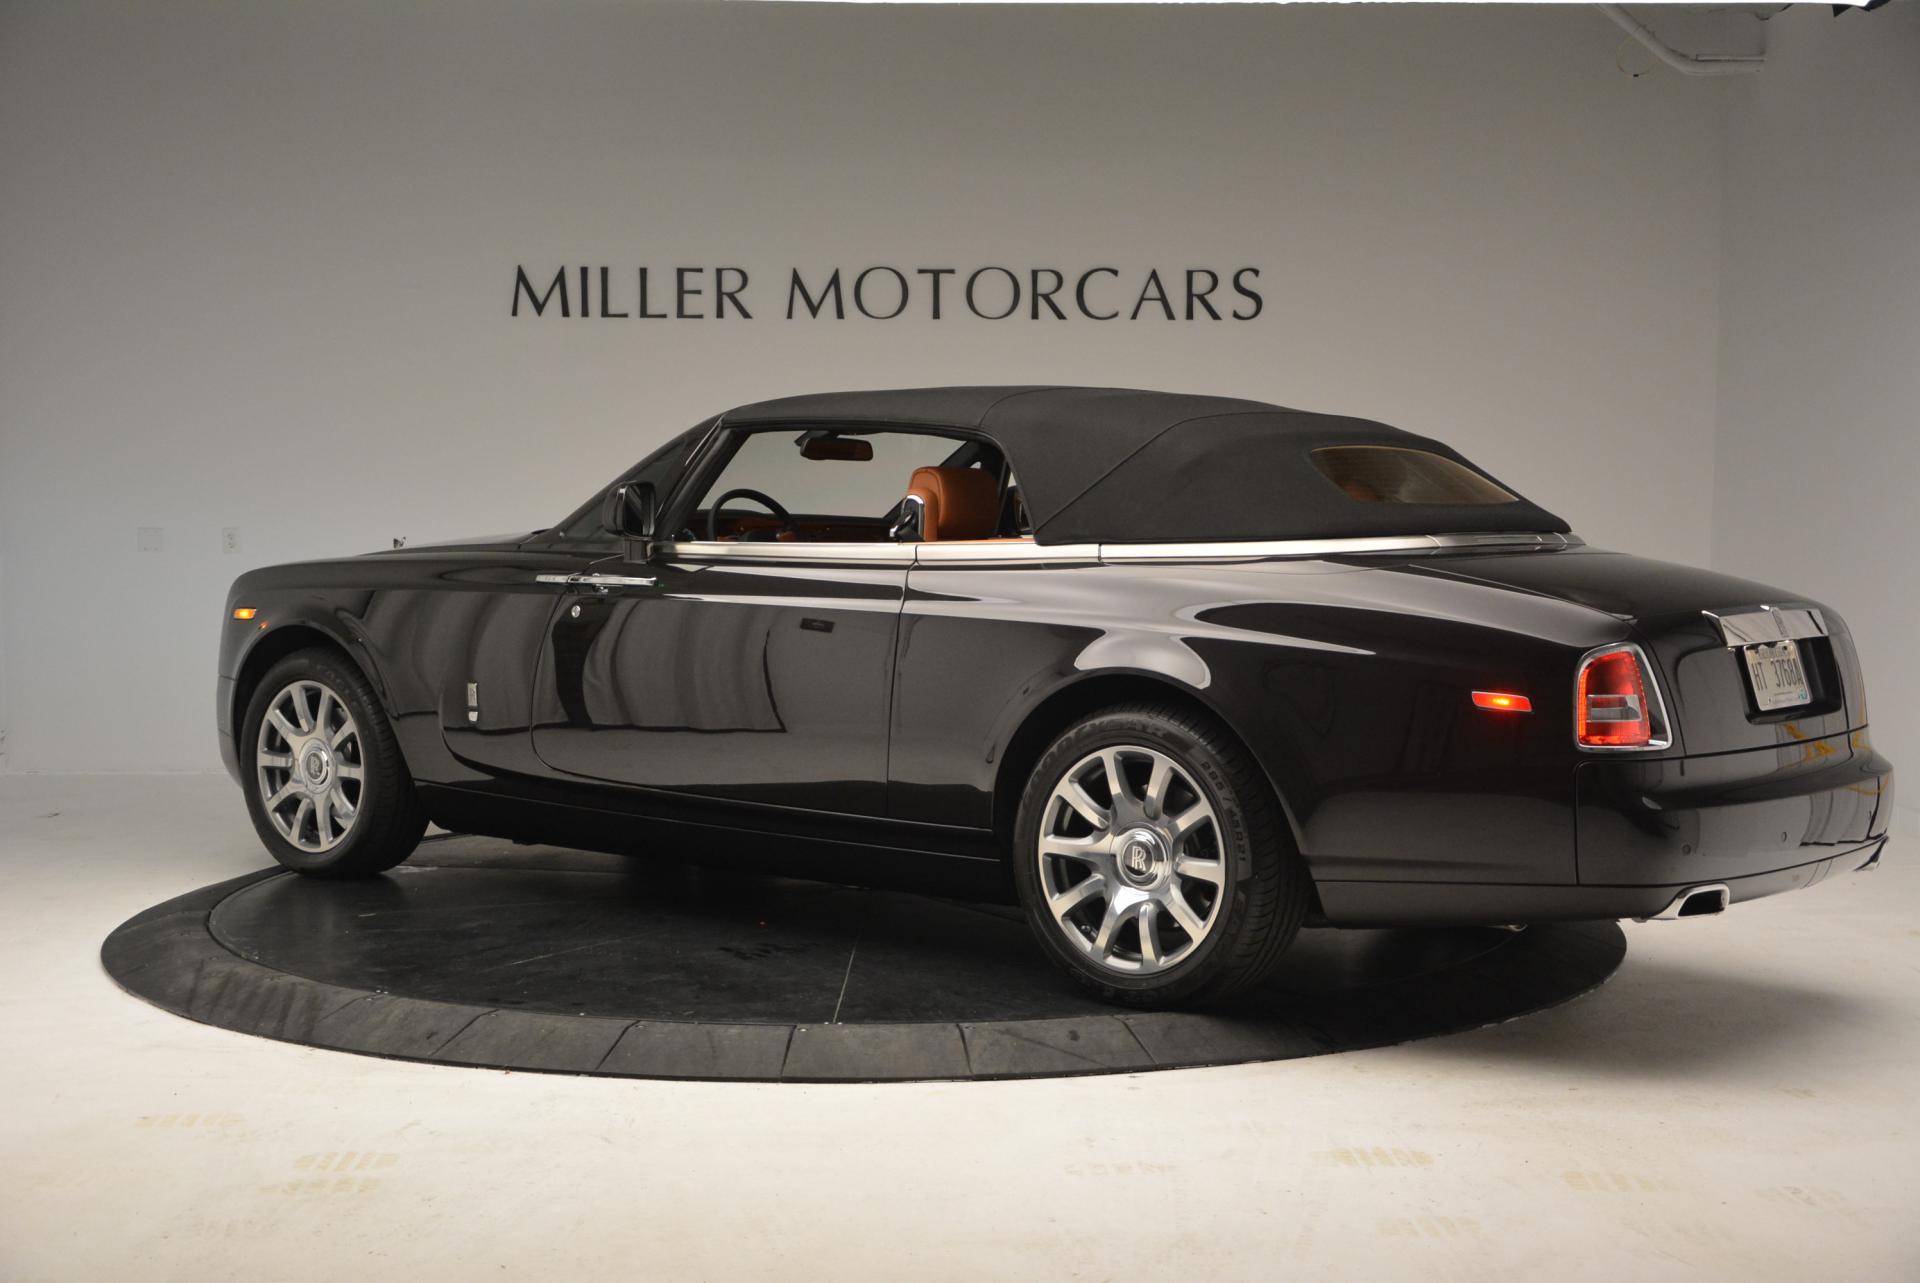 New-2016-Rolls-Royce-Phantom-Drophead-Coupe-Bespoke